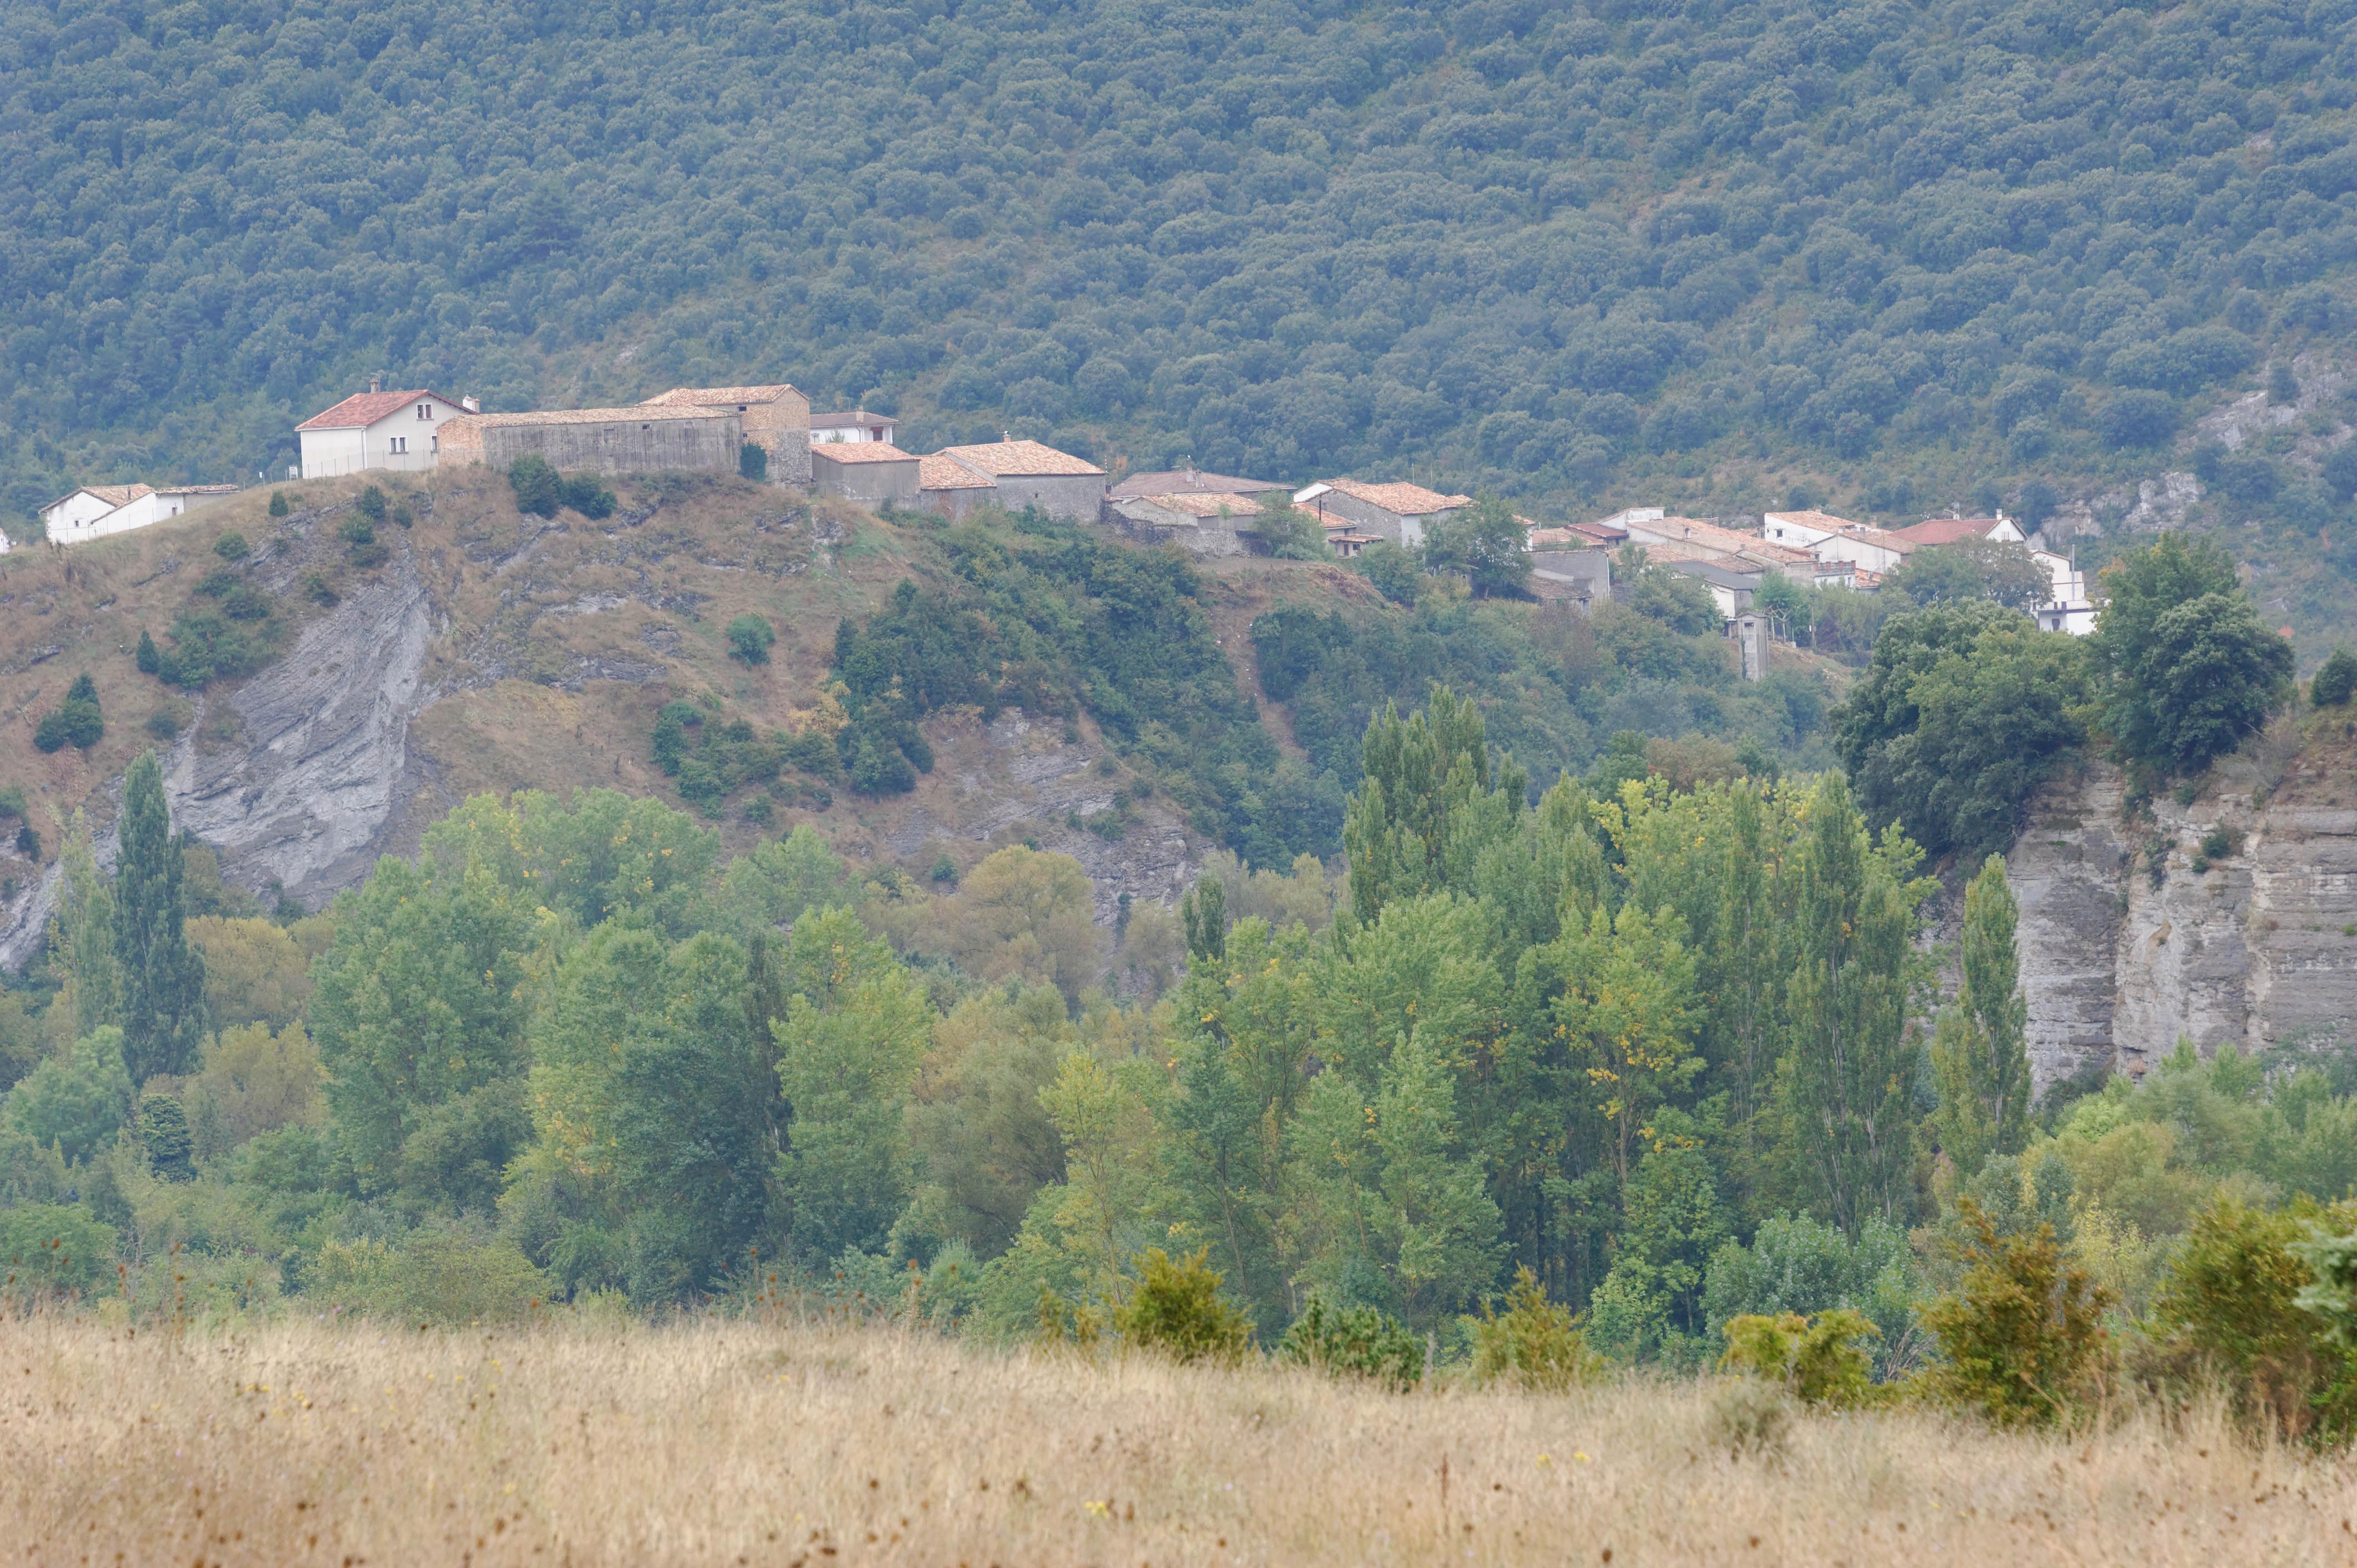 3920_vers Burgui (Aragon)